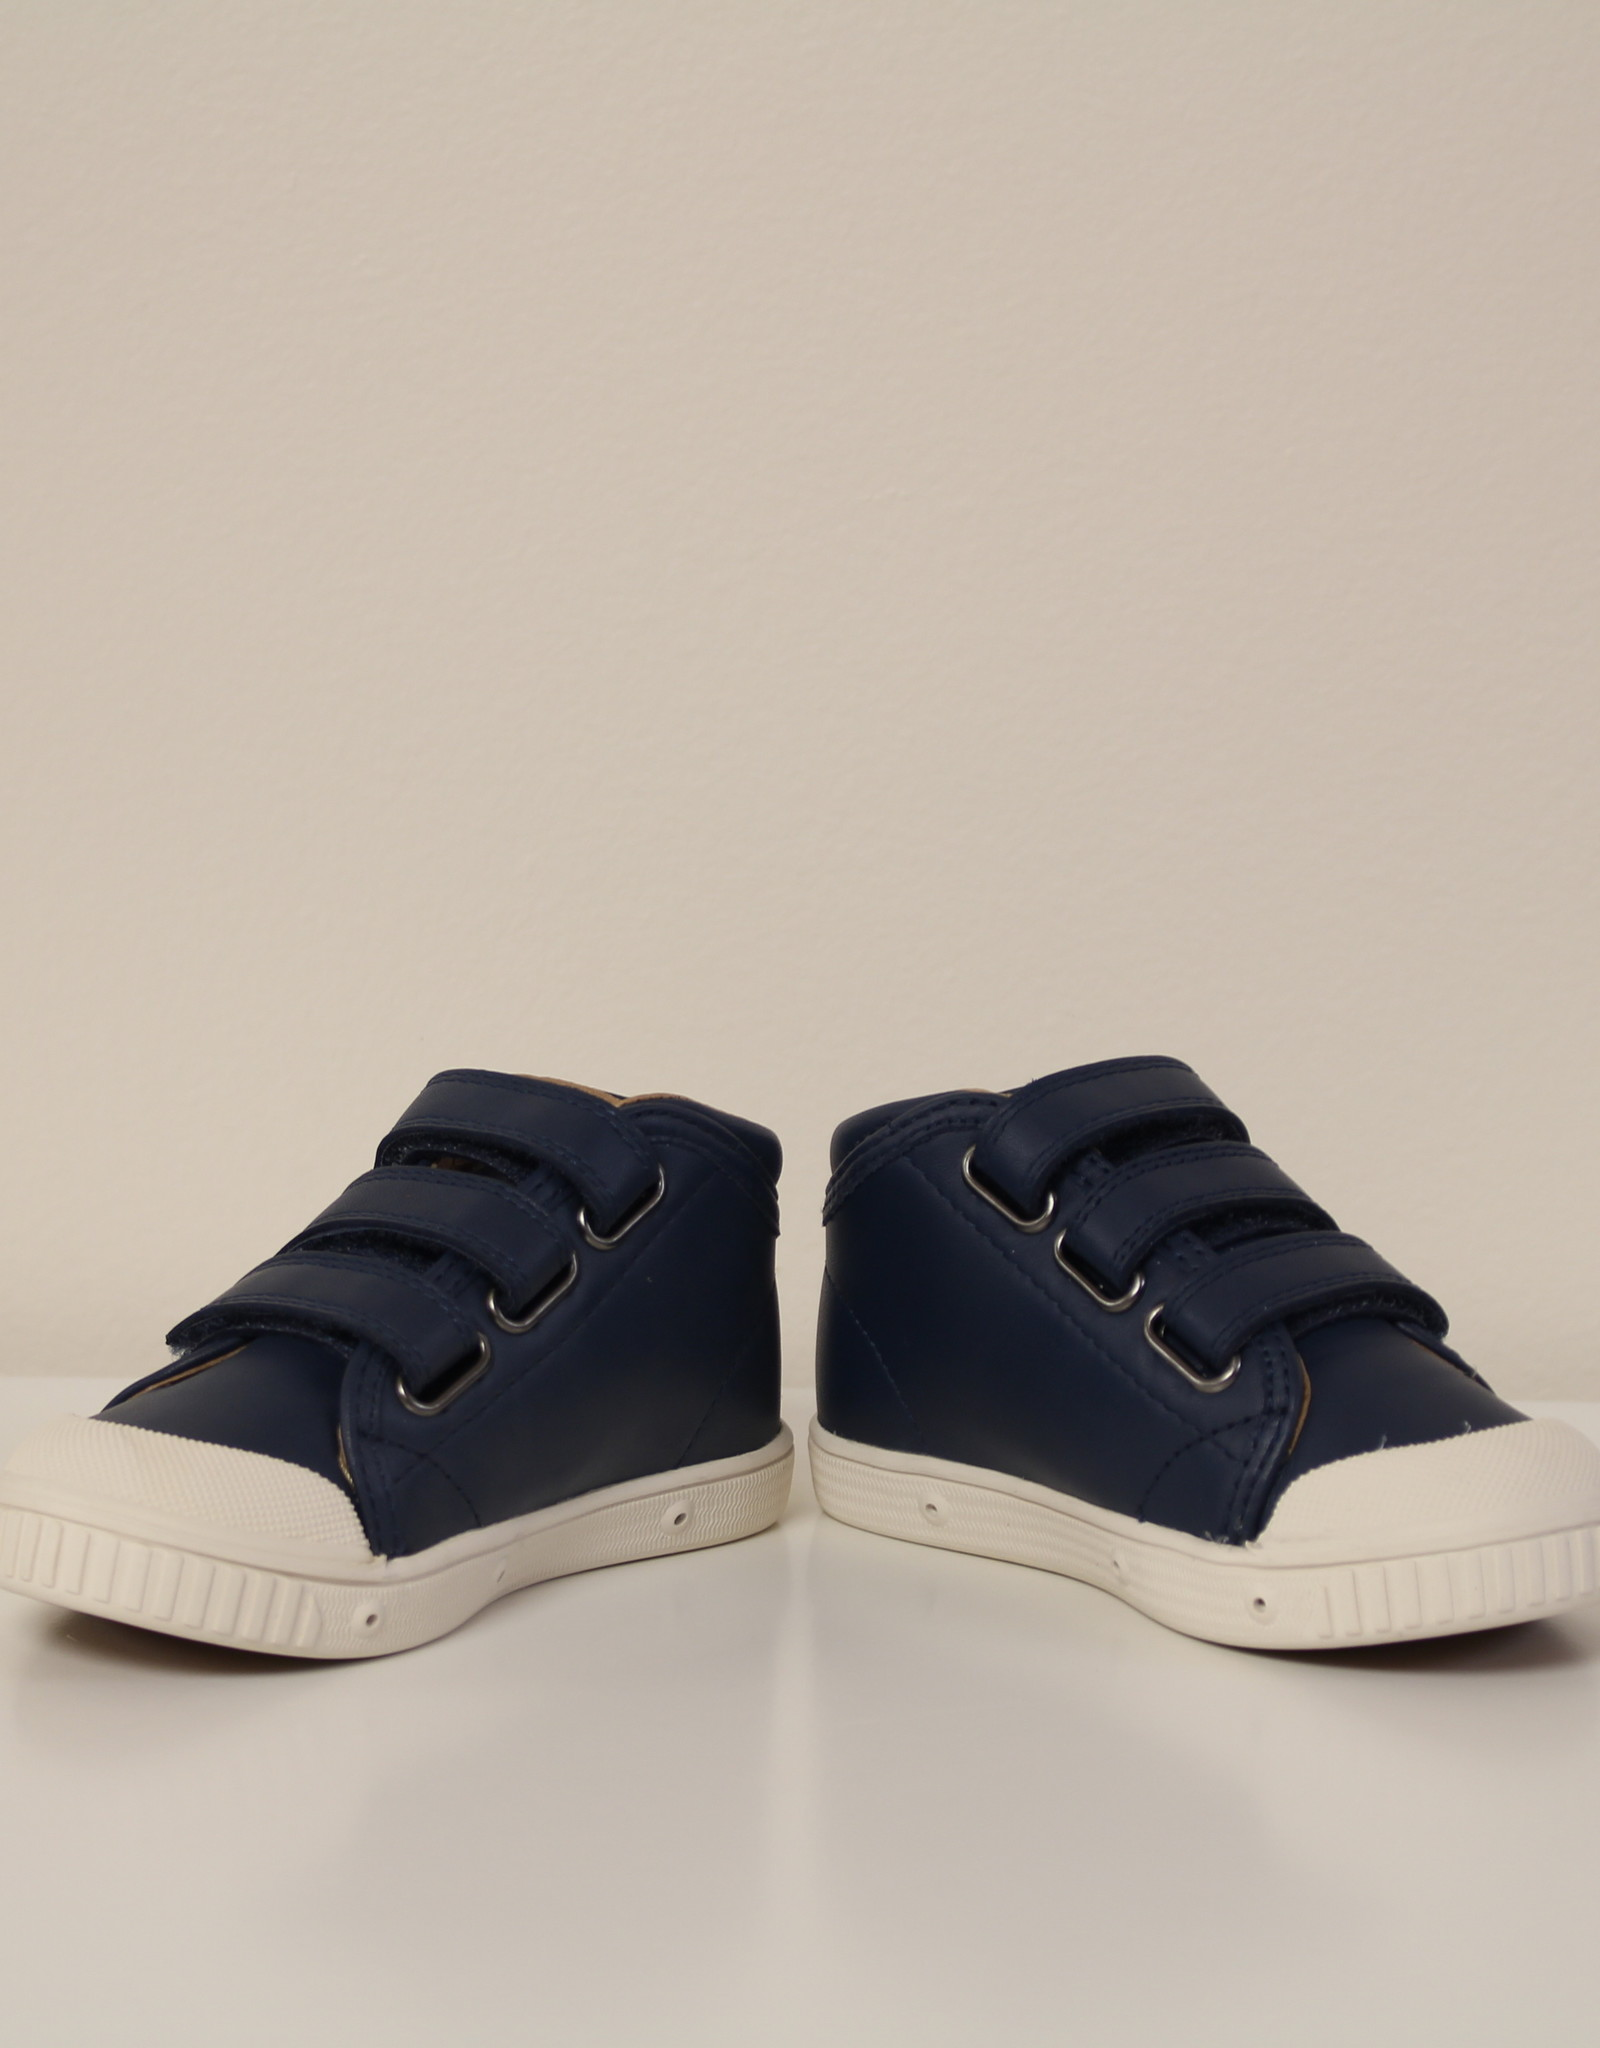 Springcourt BVK 5014-2 dark blue